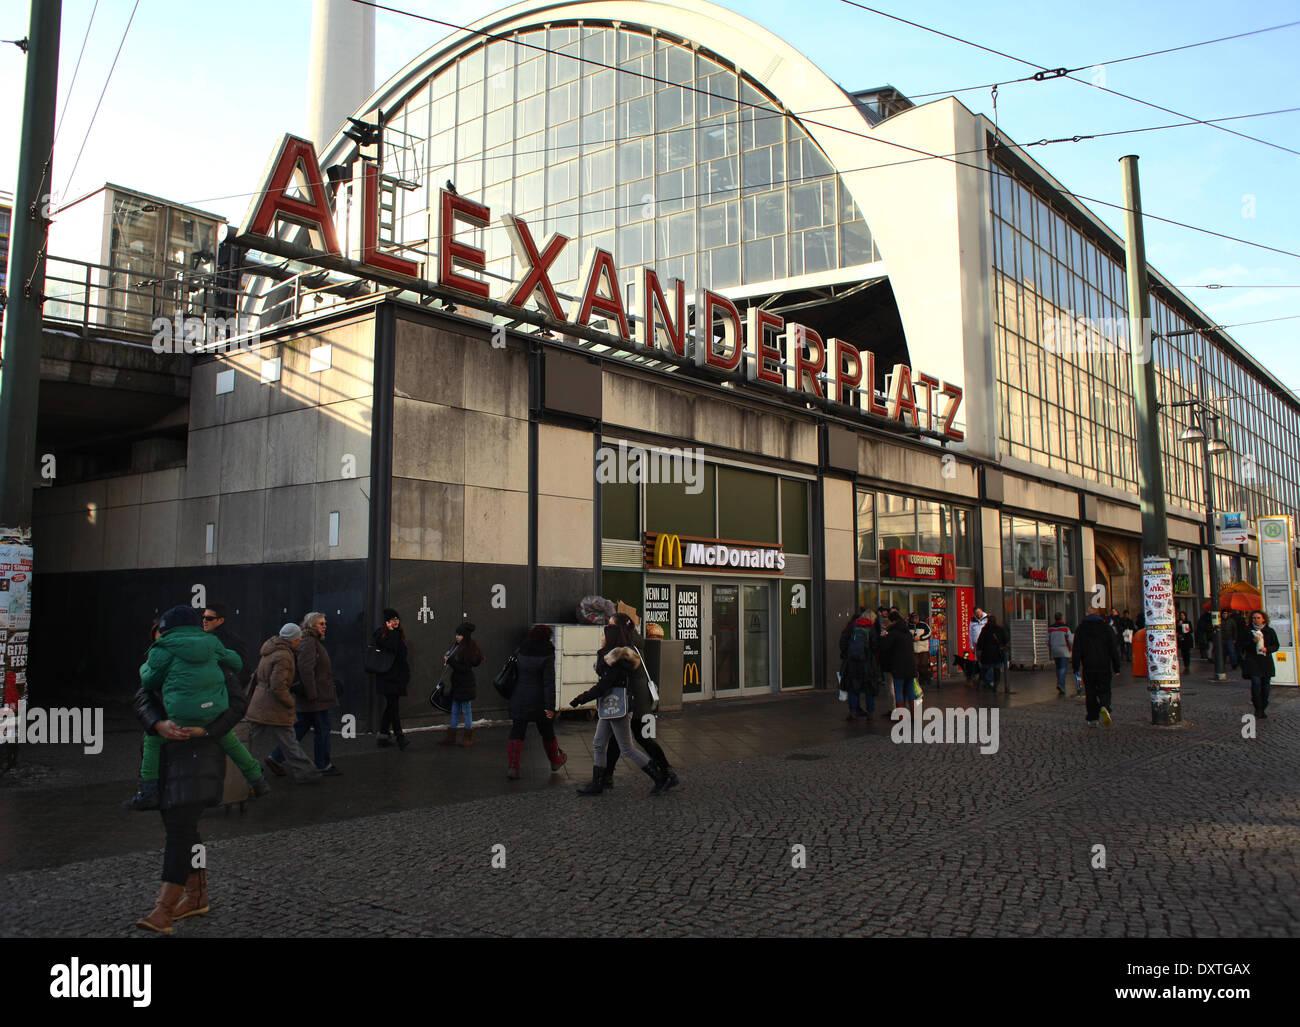 The S-Bahn station Berlin Alexanderplatz, pictured on February 02, 2014. Photo: Wolfram Steinberg dpa Stock Photo